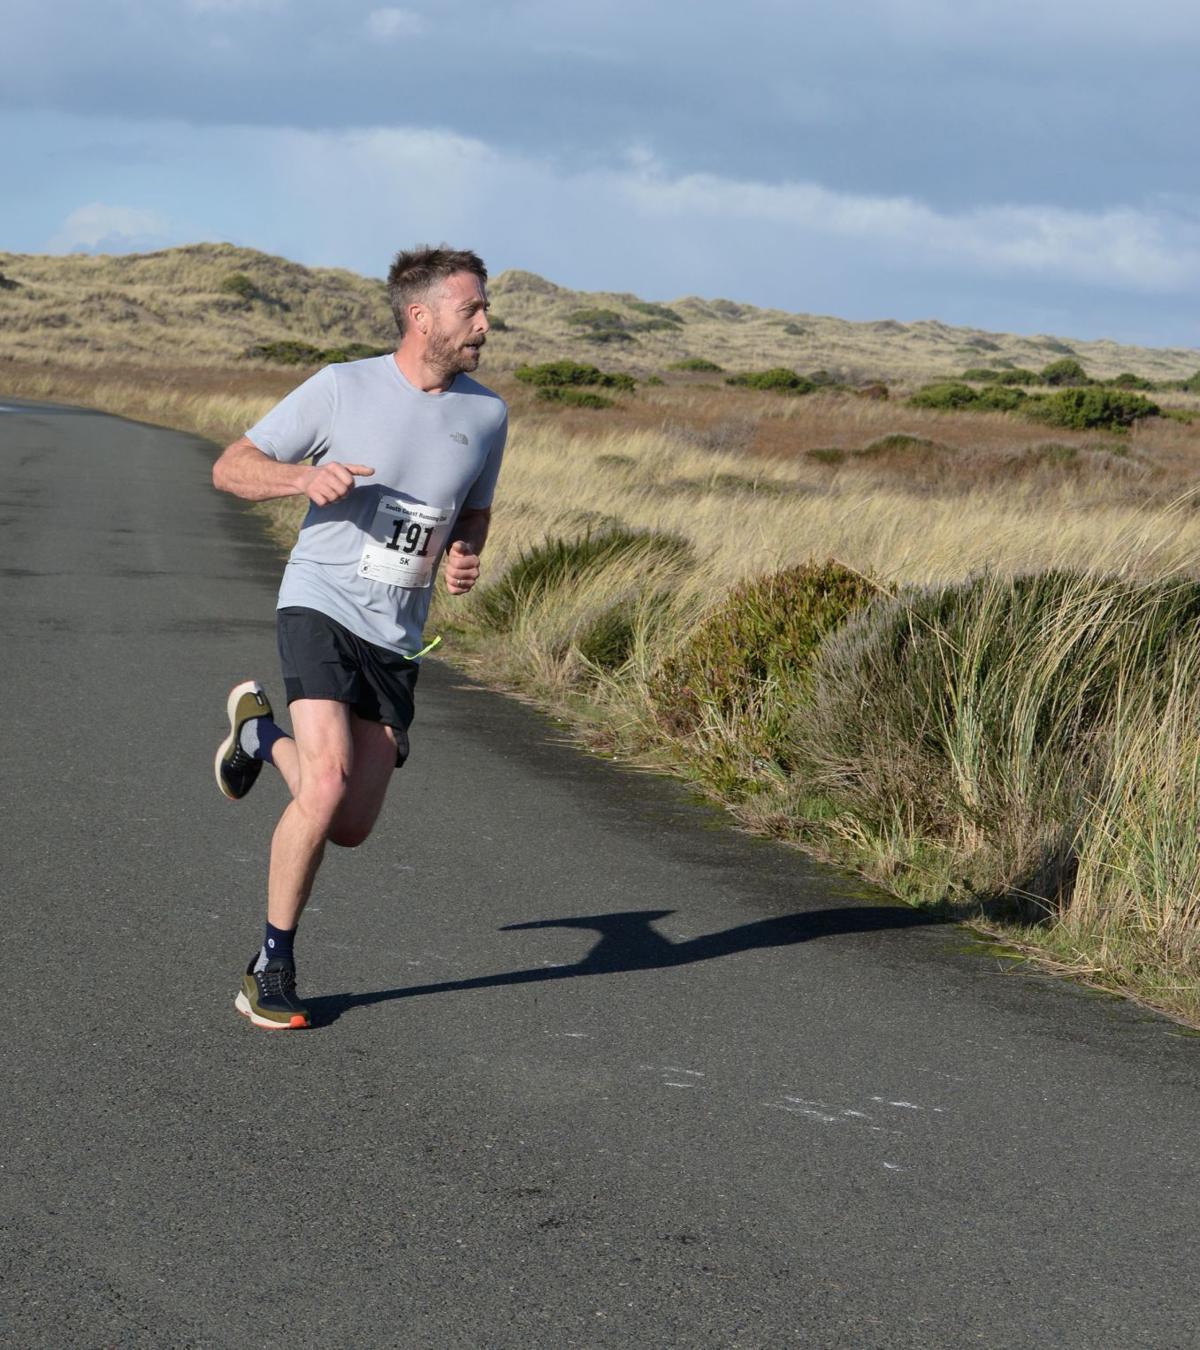 Bullards Run 2019 - Brent Hutton